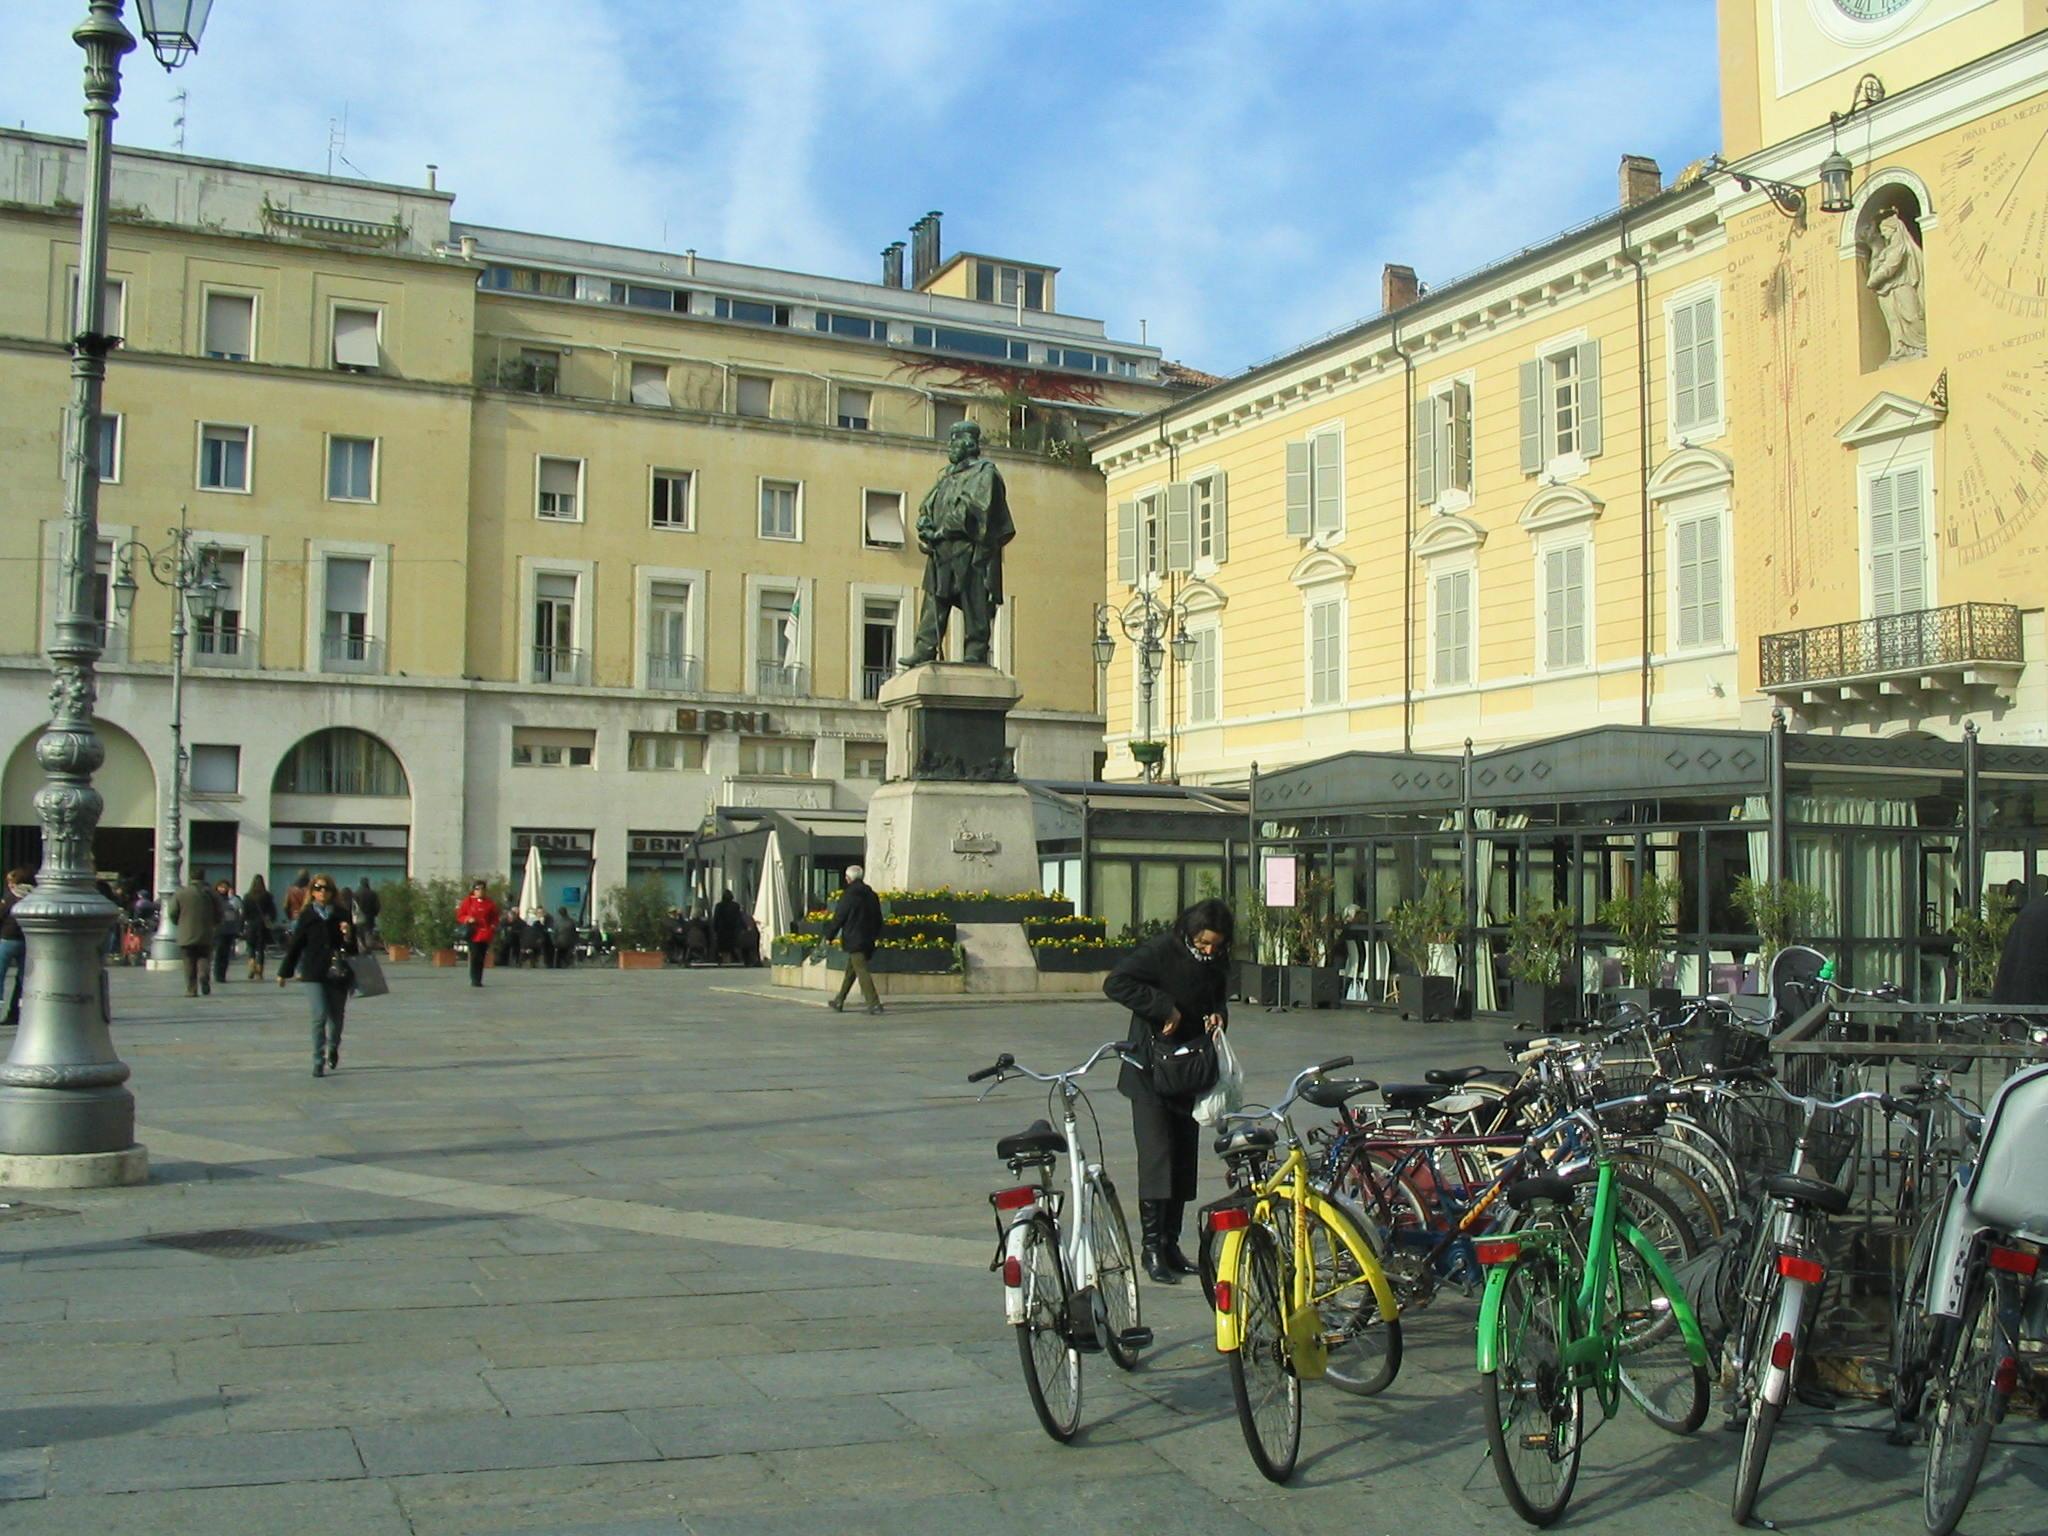 Piazza Garibaldi, the Center of activity